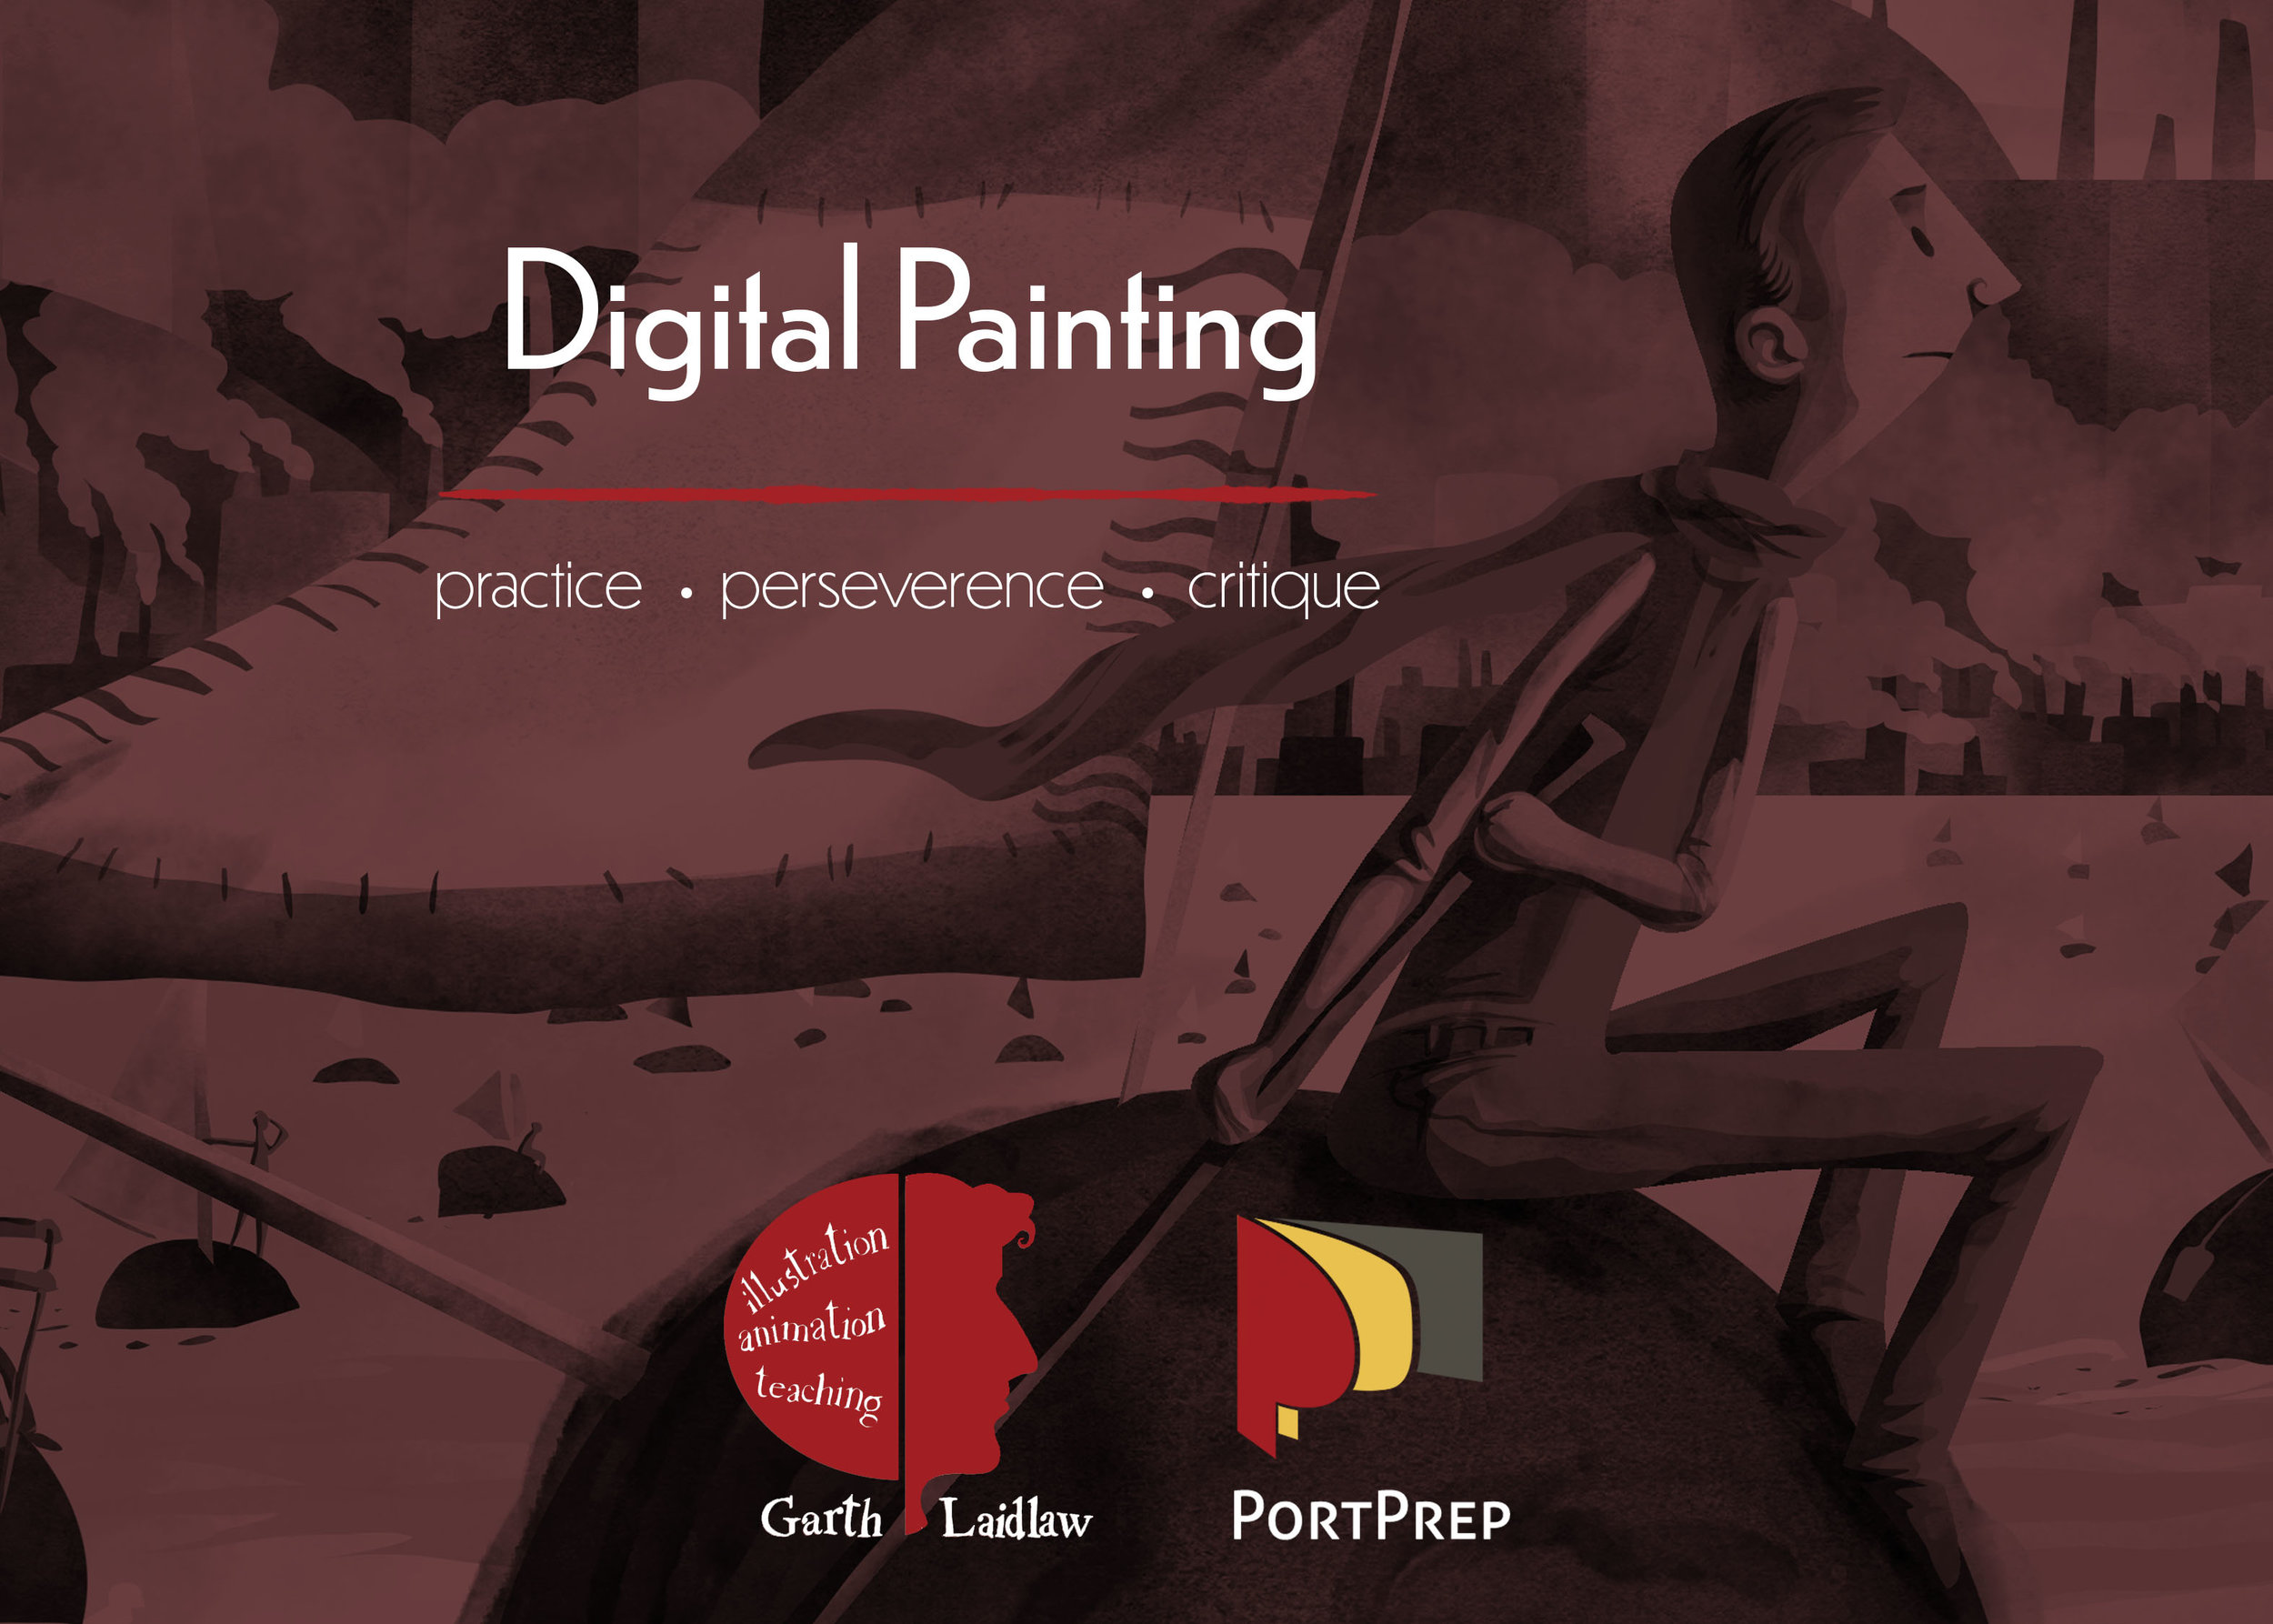 PortPrep 8-week Class Postcard-digital painting-front.jpg